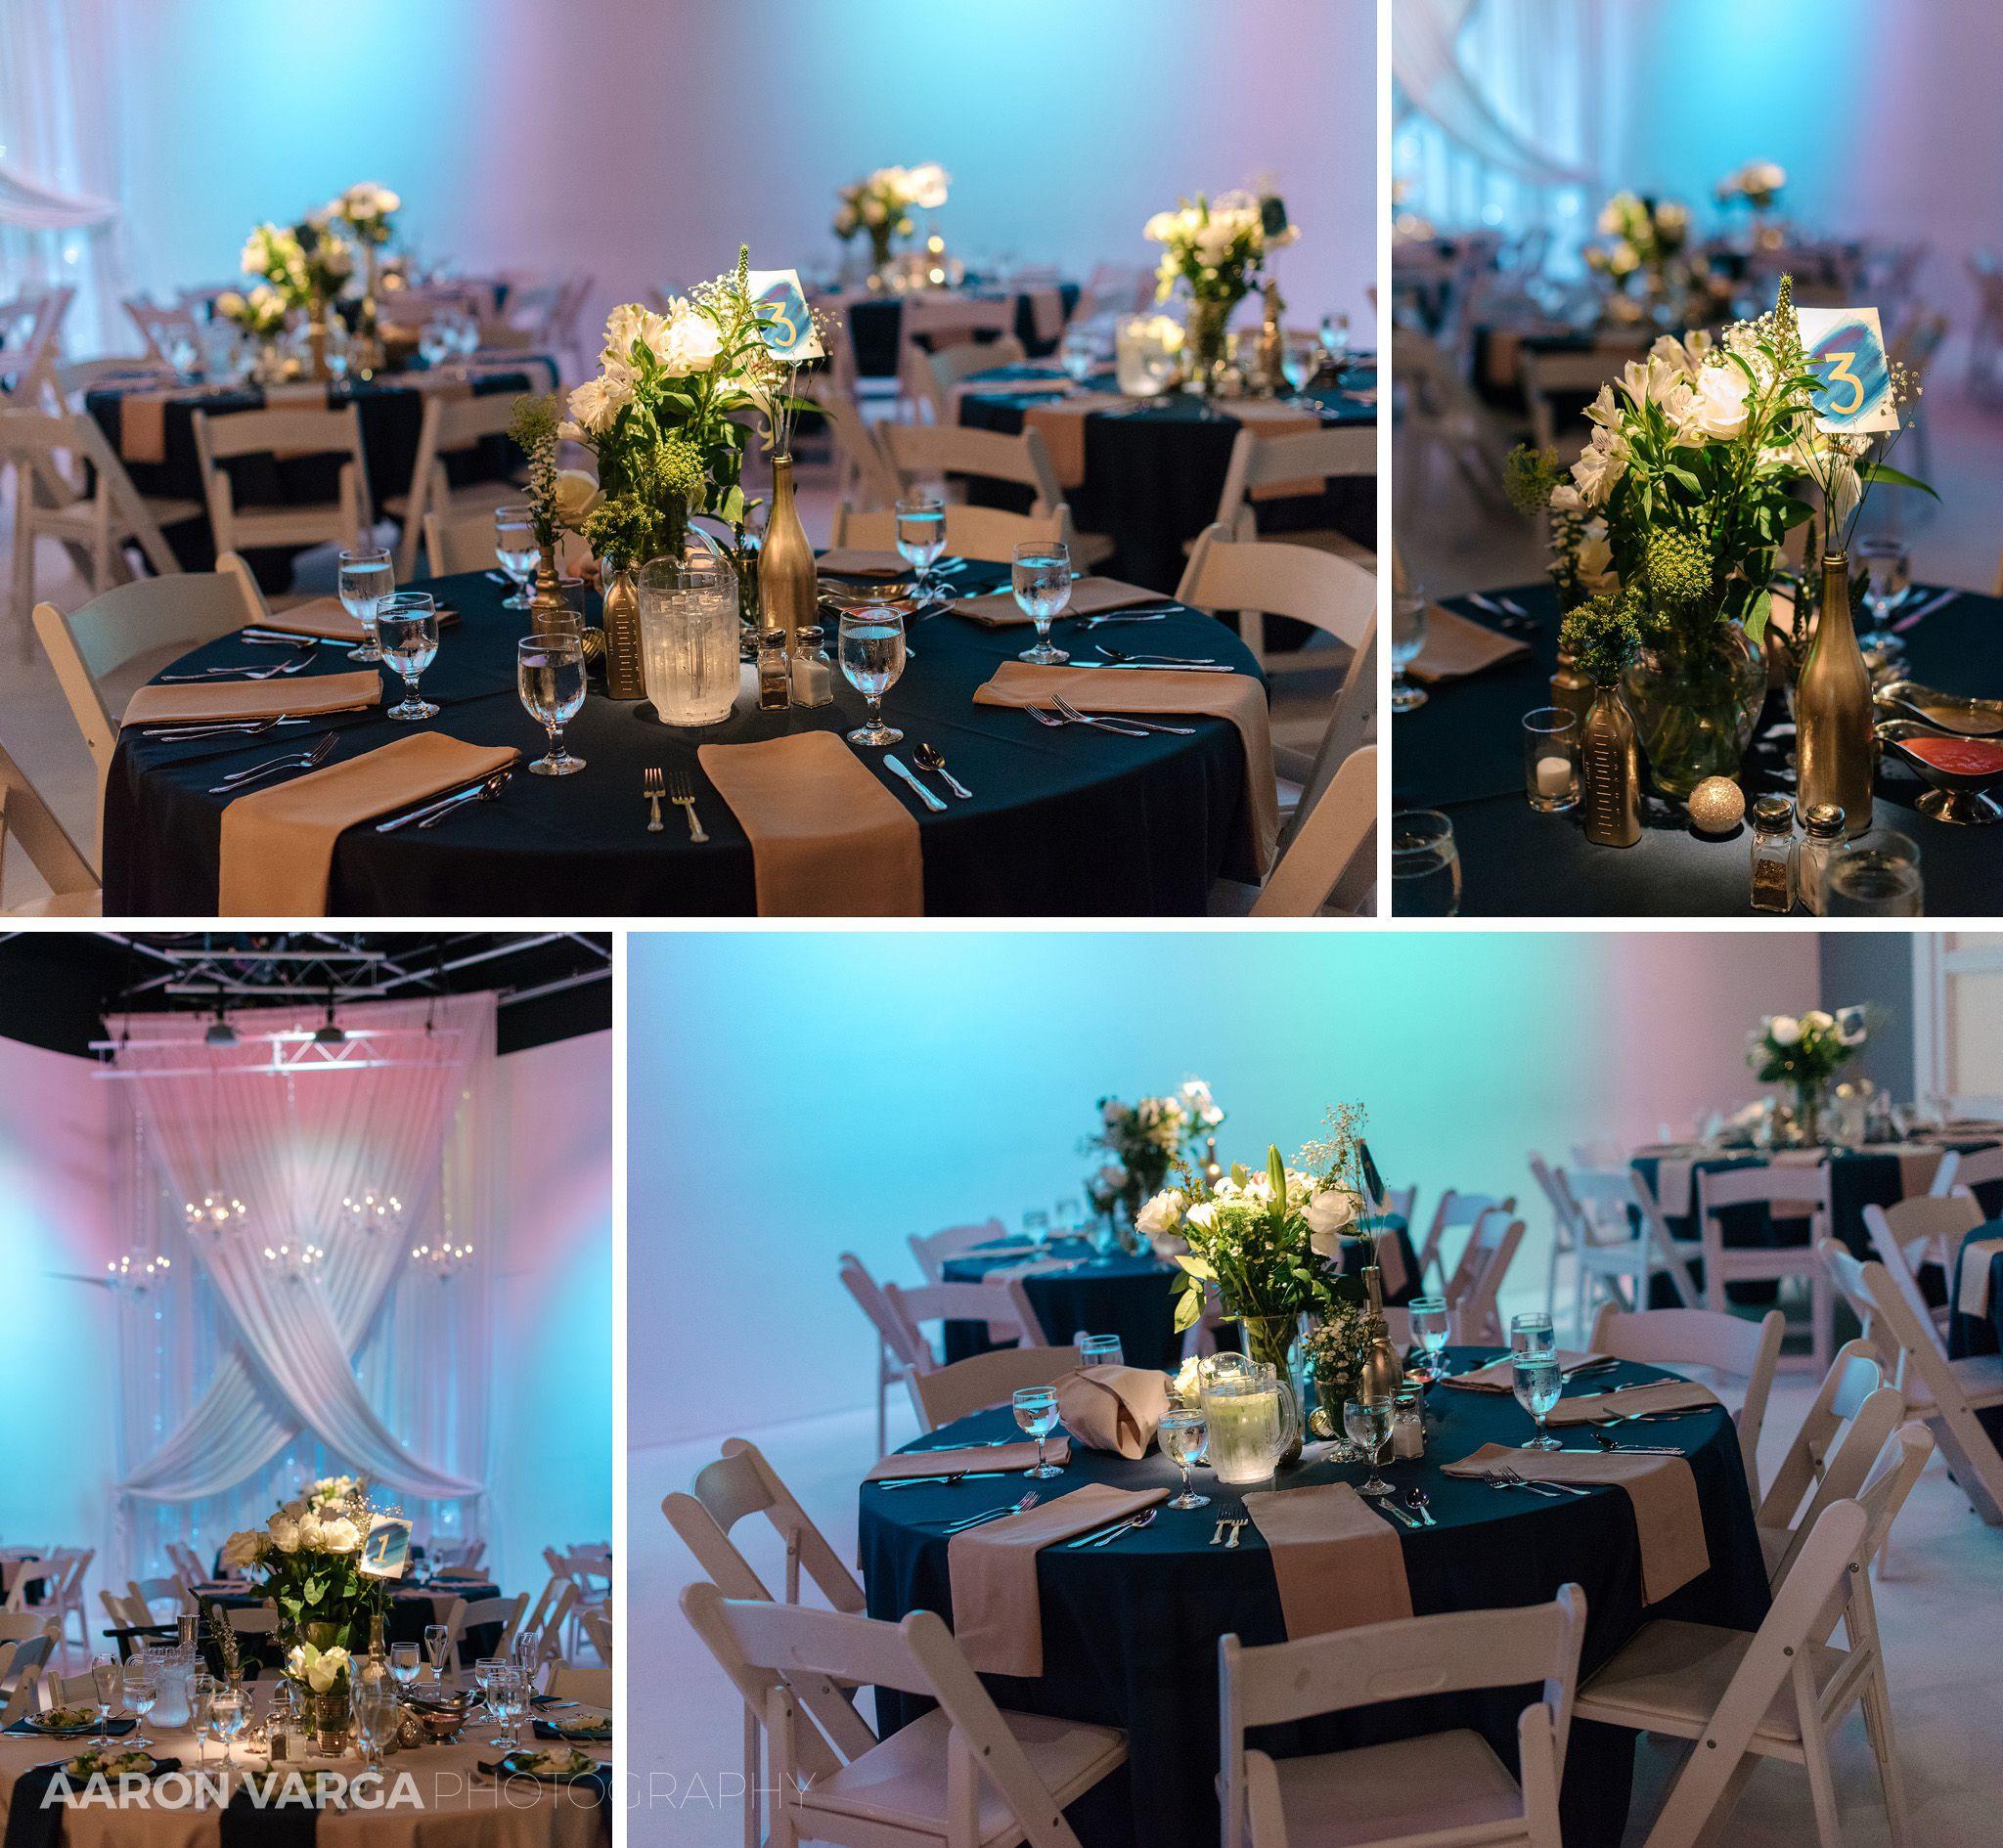 Aaron Varga Photography Pittsburgh Wedding Photographer J Verno Studios Reception